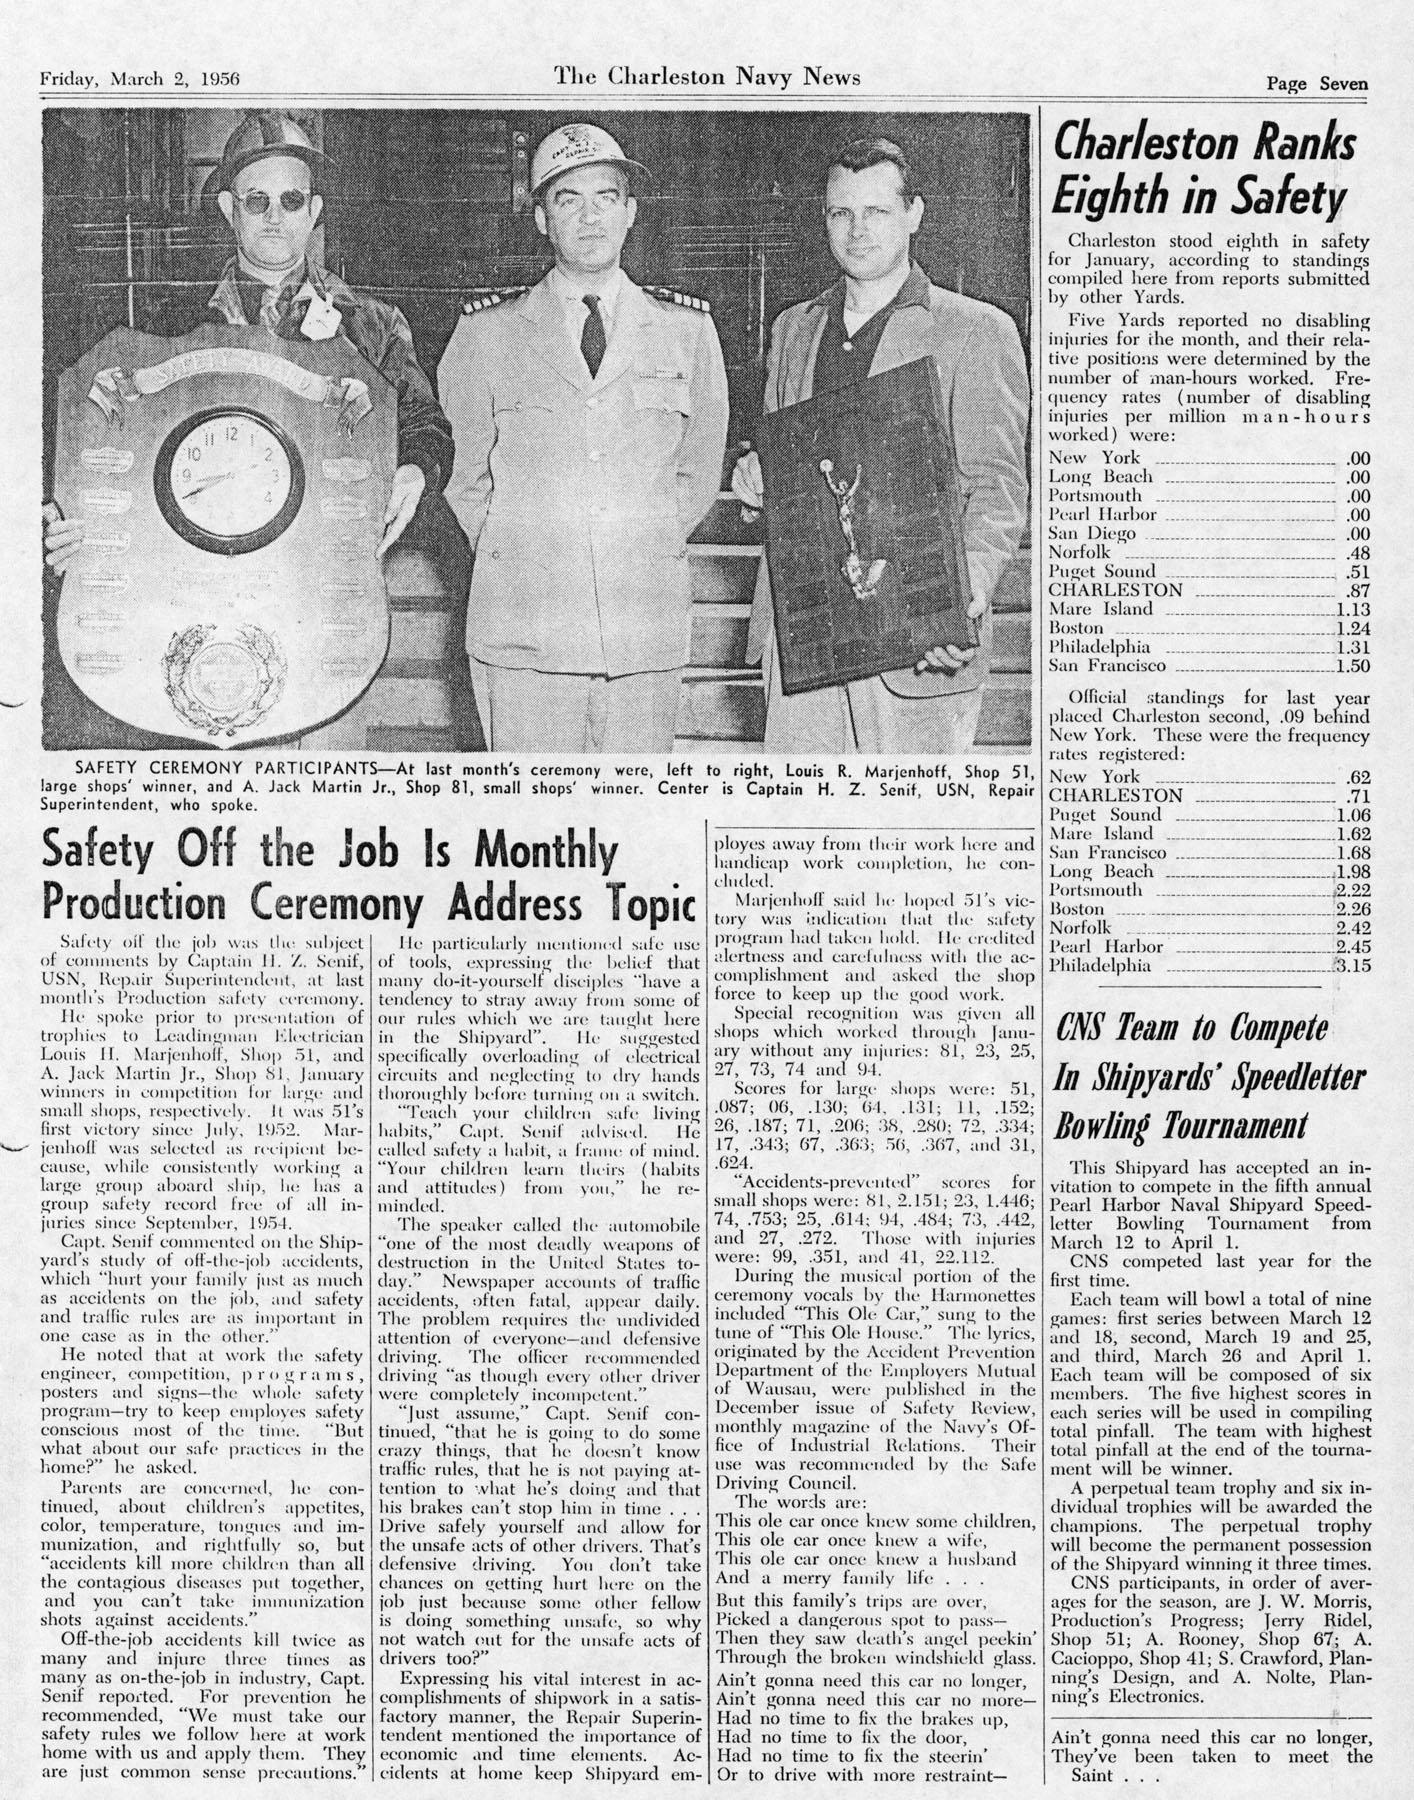 The Charleston Navy News, Volume 14, Edition 16, page vii